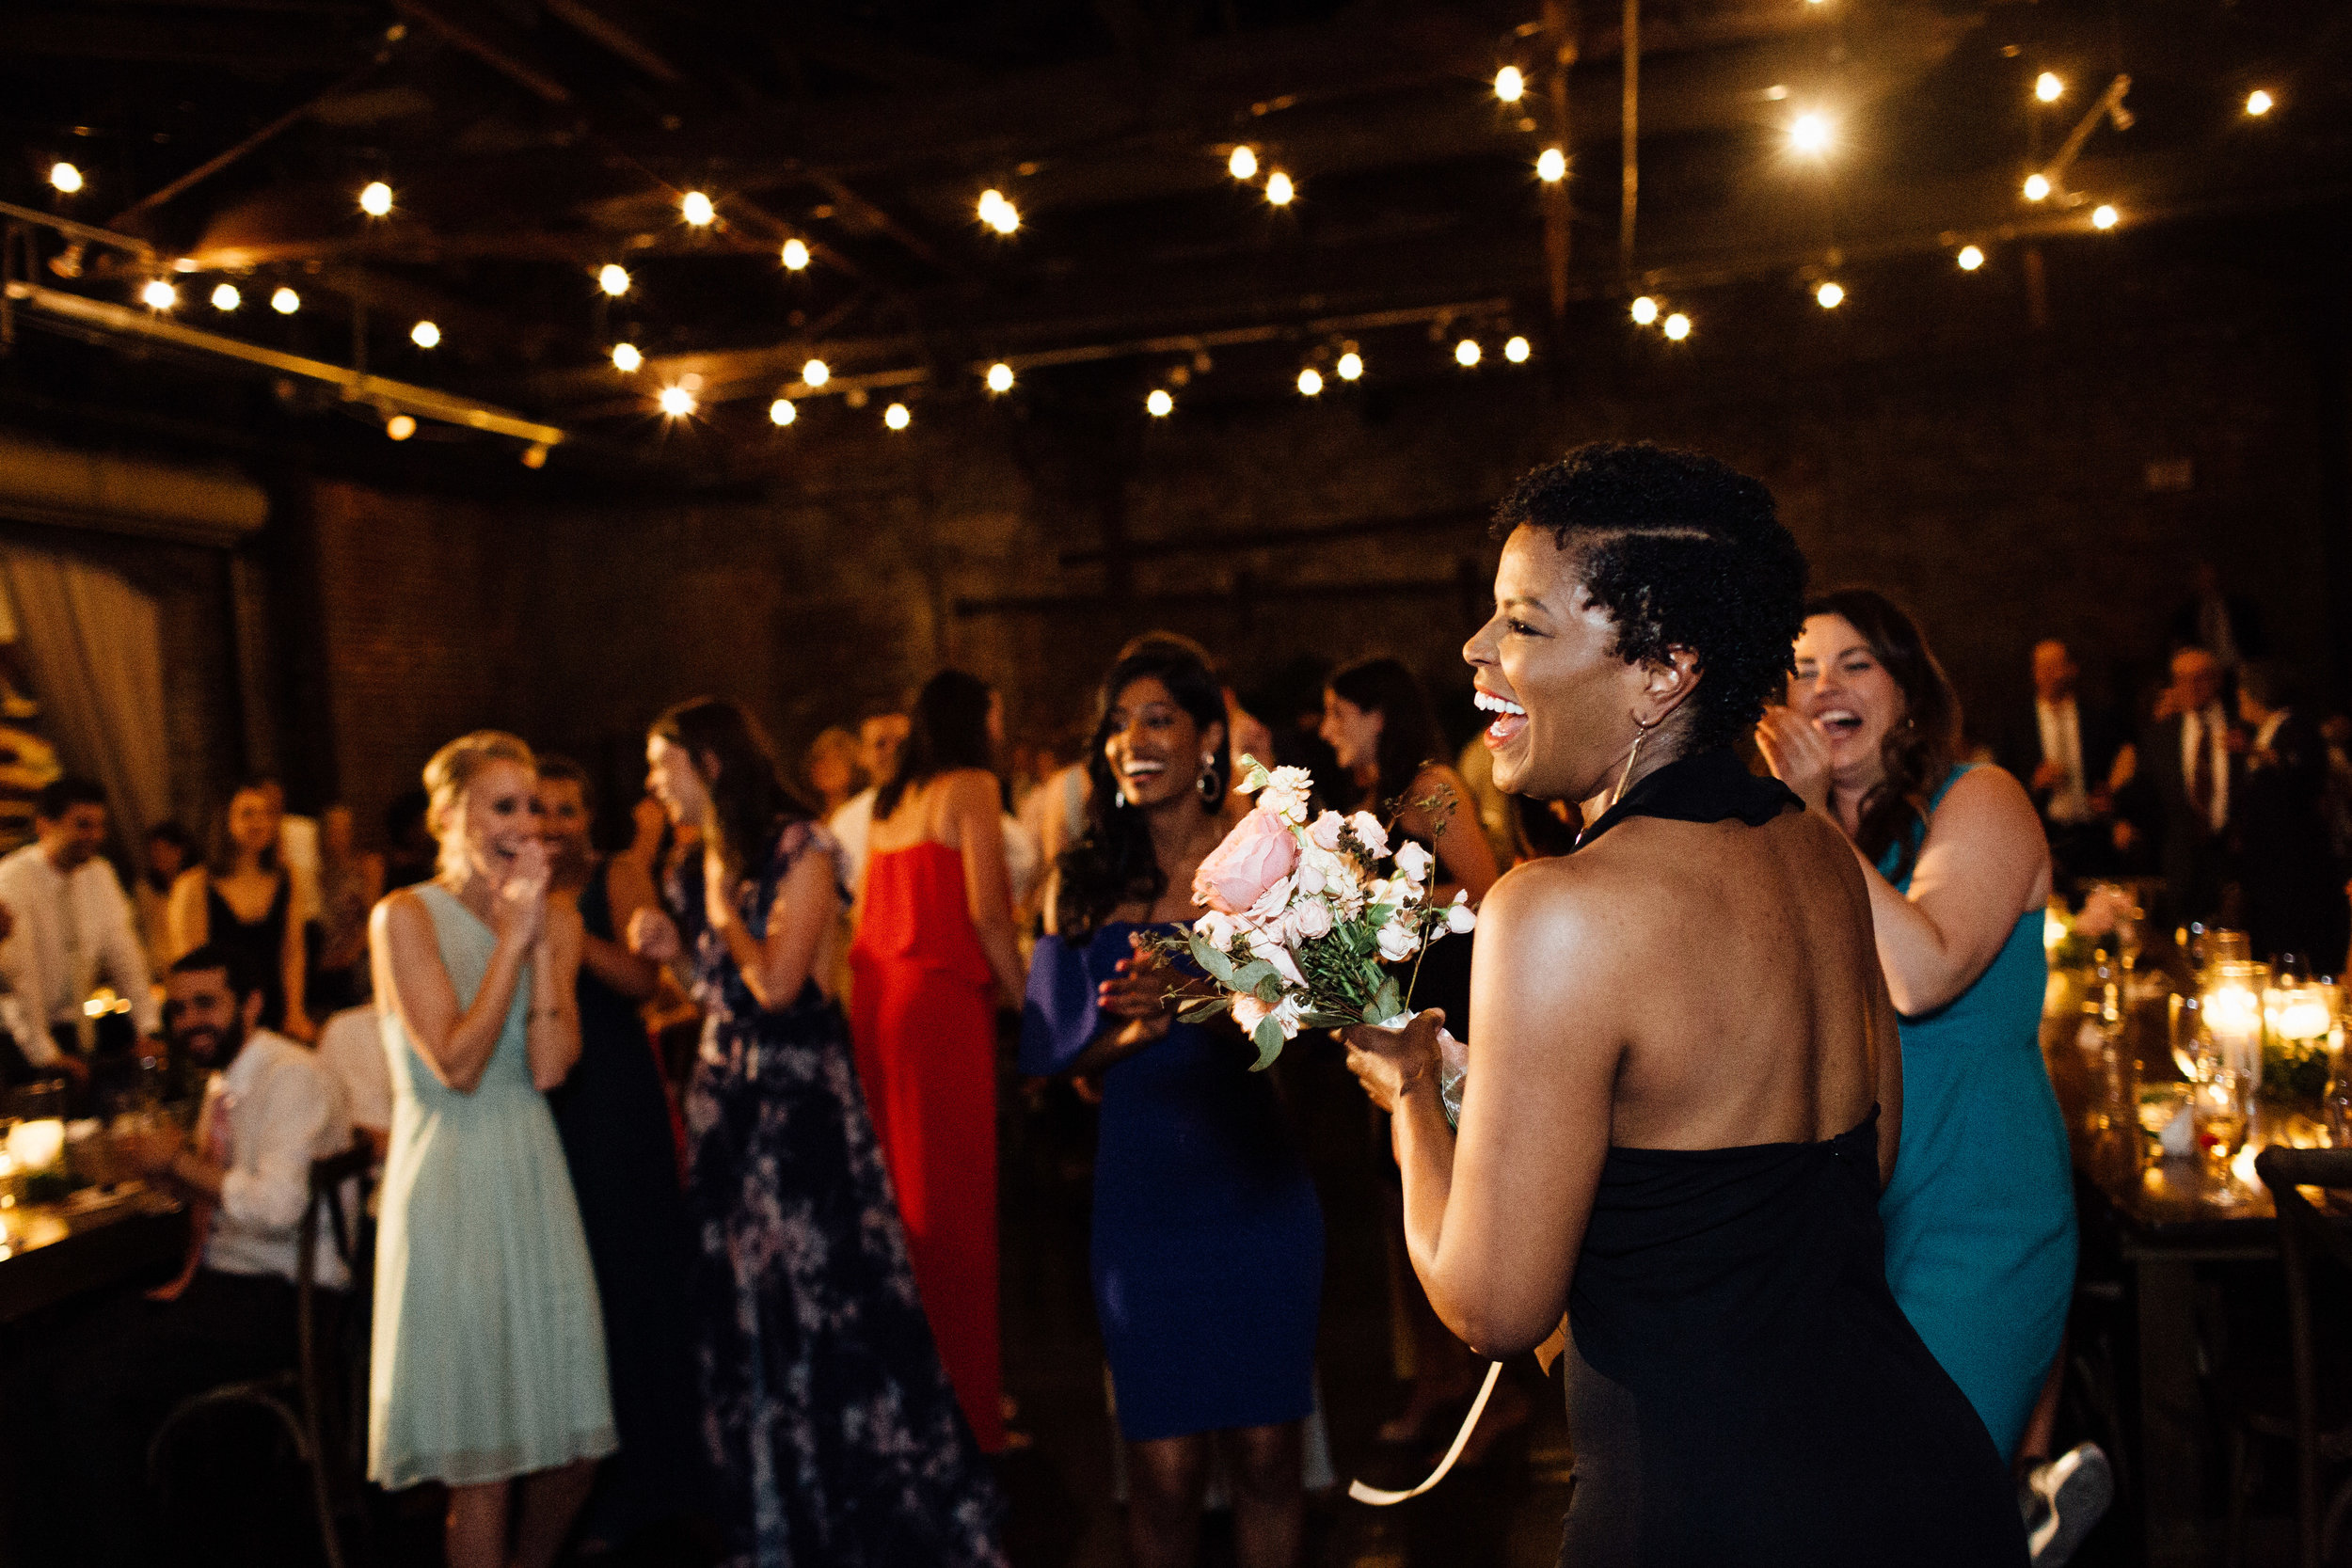 king_plow_atlanta_wedding_art_gallery_modern_lifestyle_documentary_2028.jpg